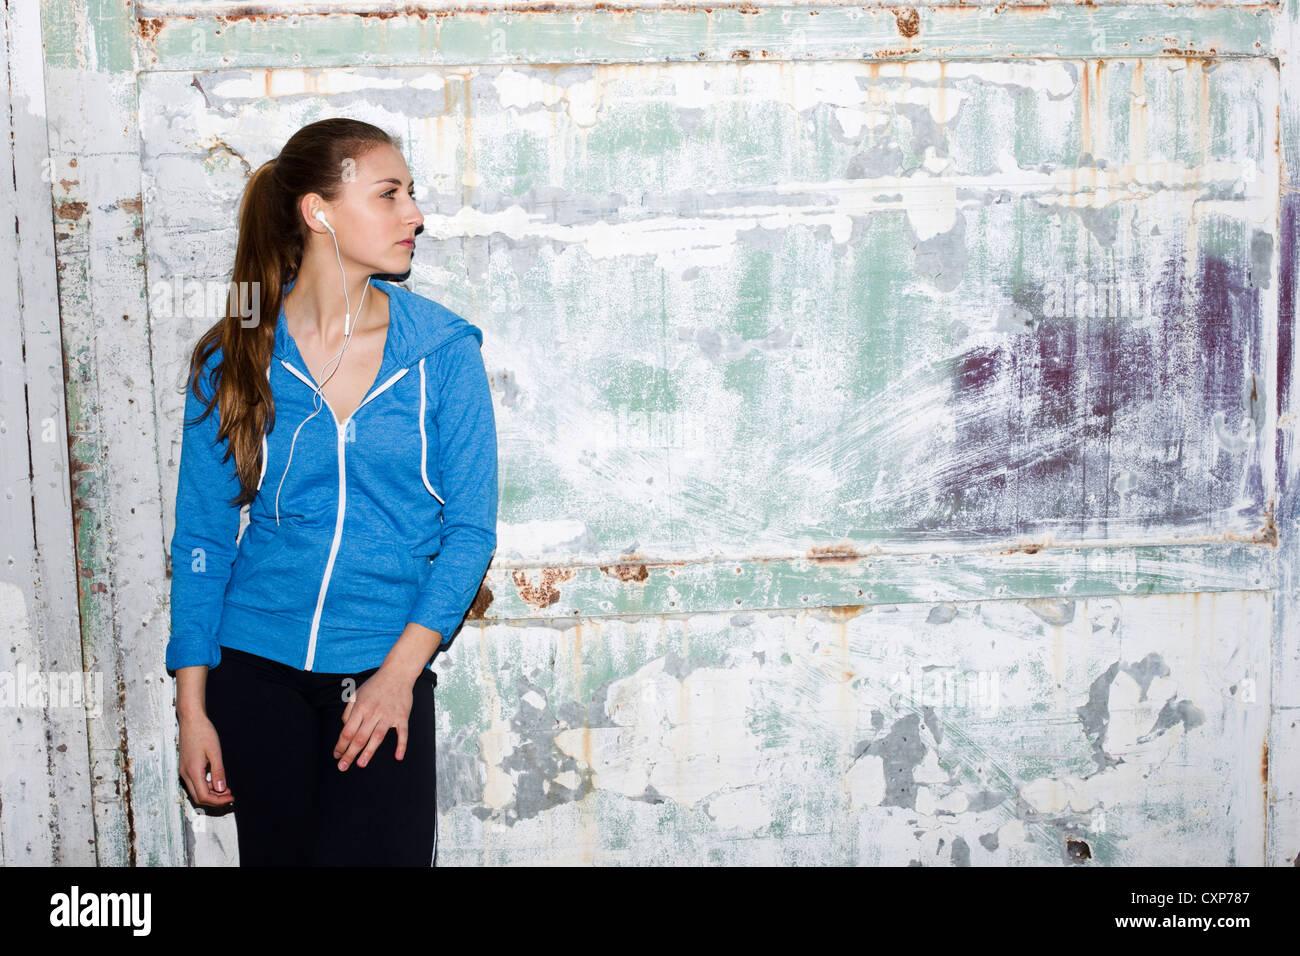 Mujer vistiendo ropa deportiva Imagen De Stock